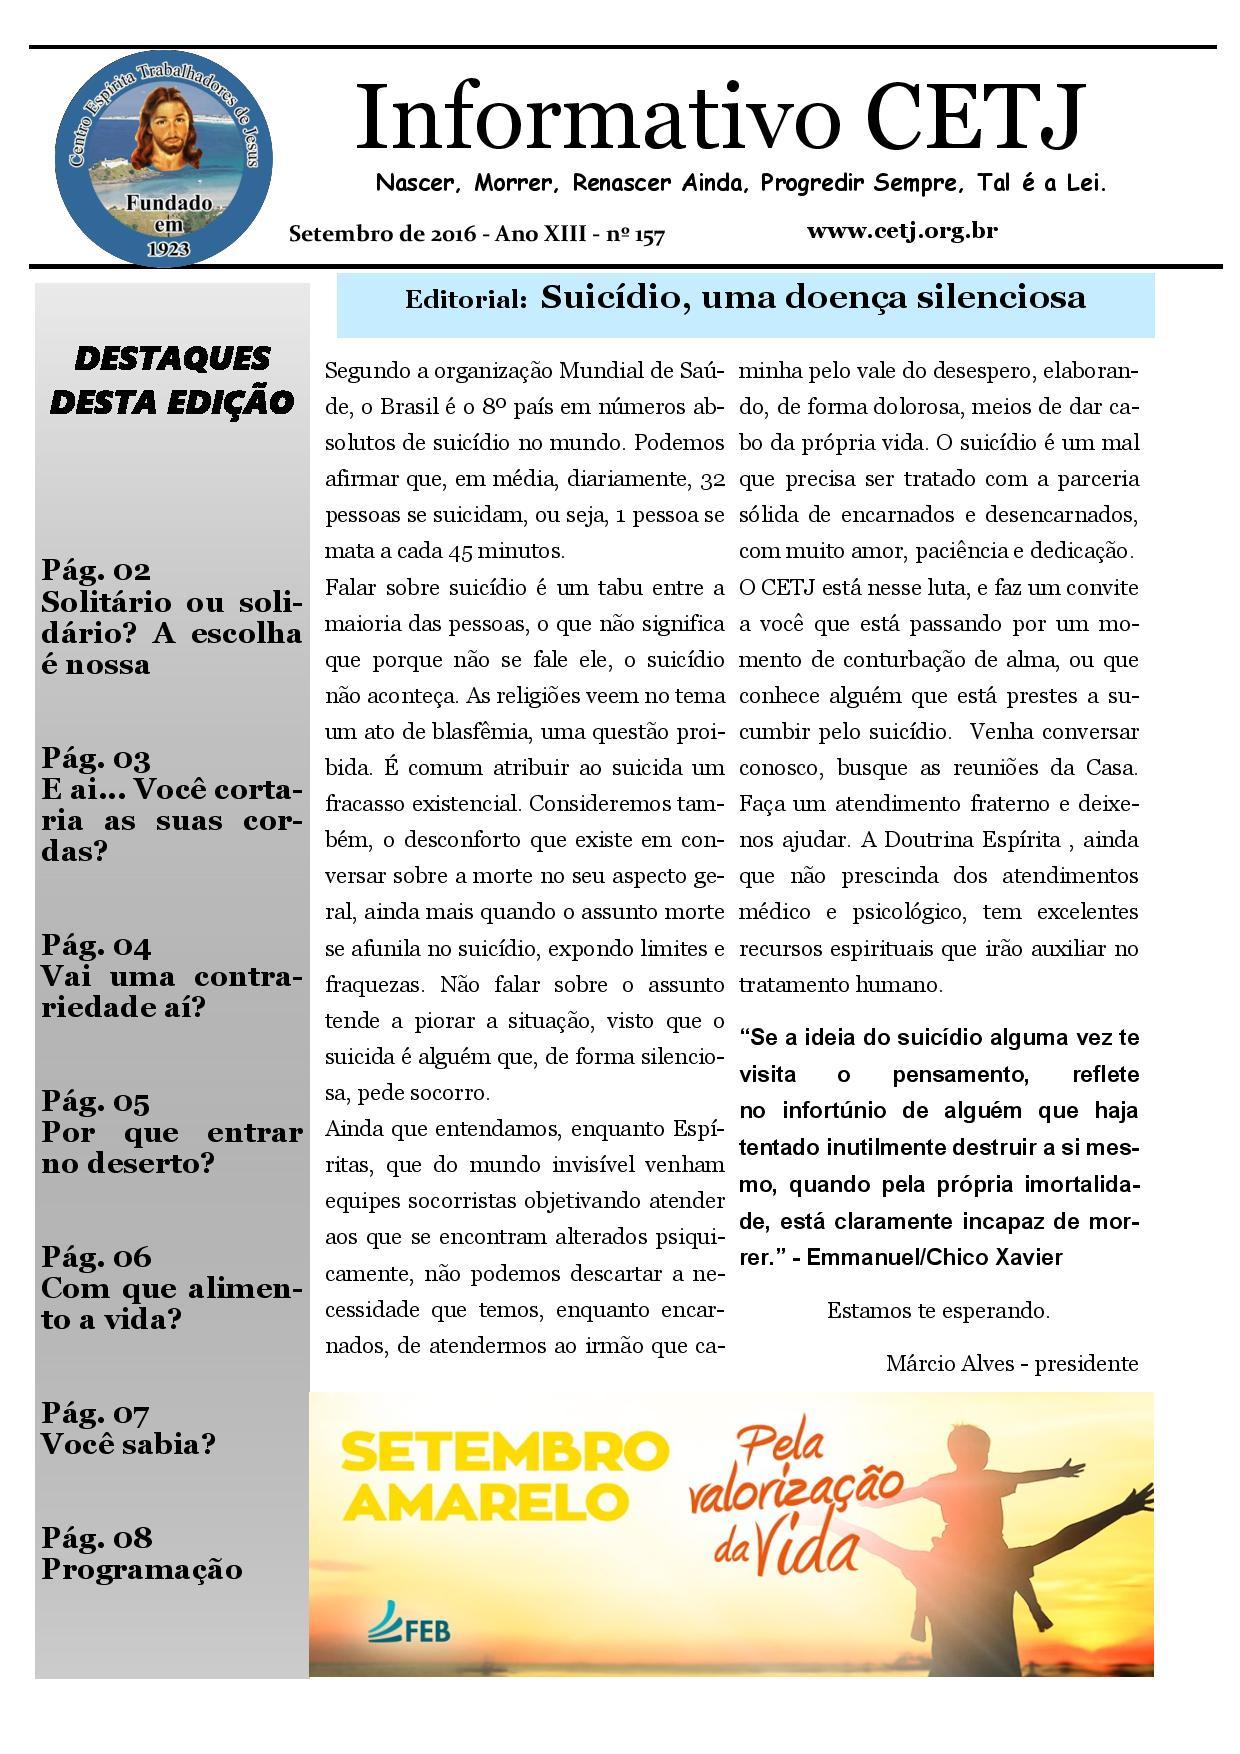 Informativo setembro de 2016_net-page-001